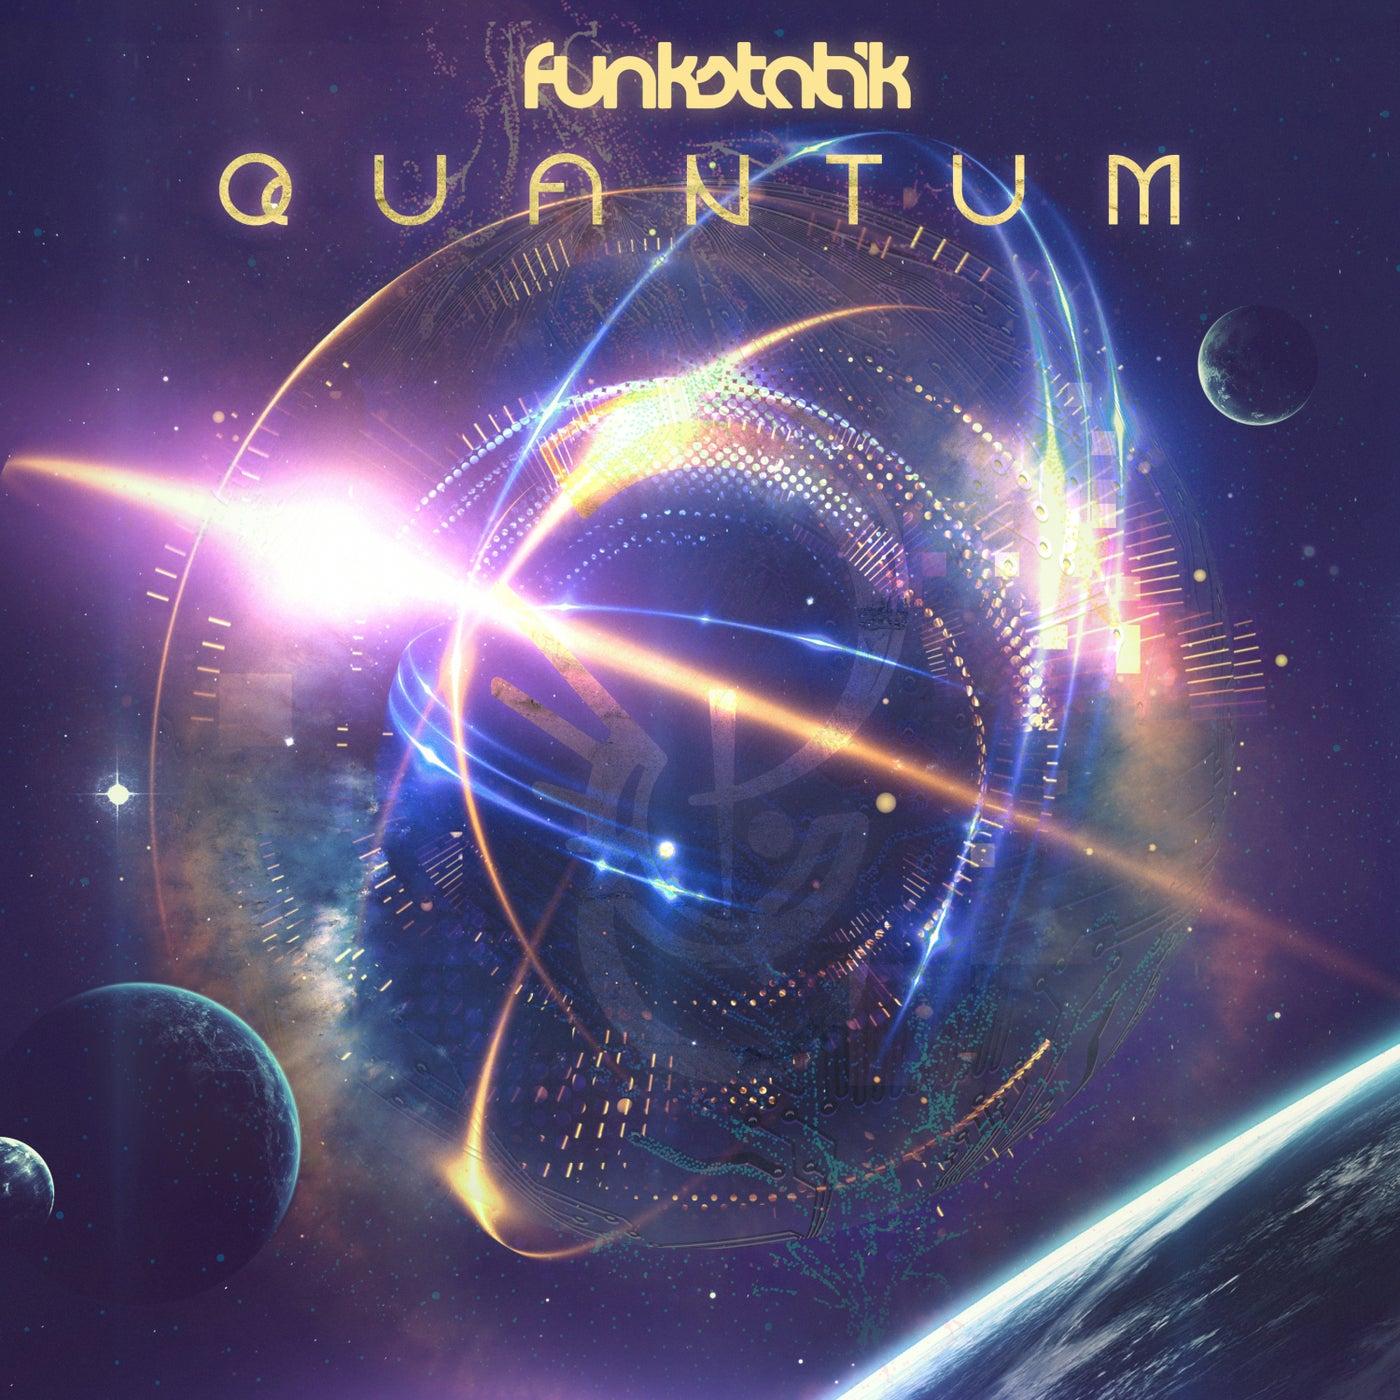 Universe (Original Mix)